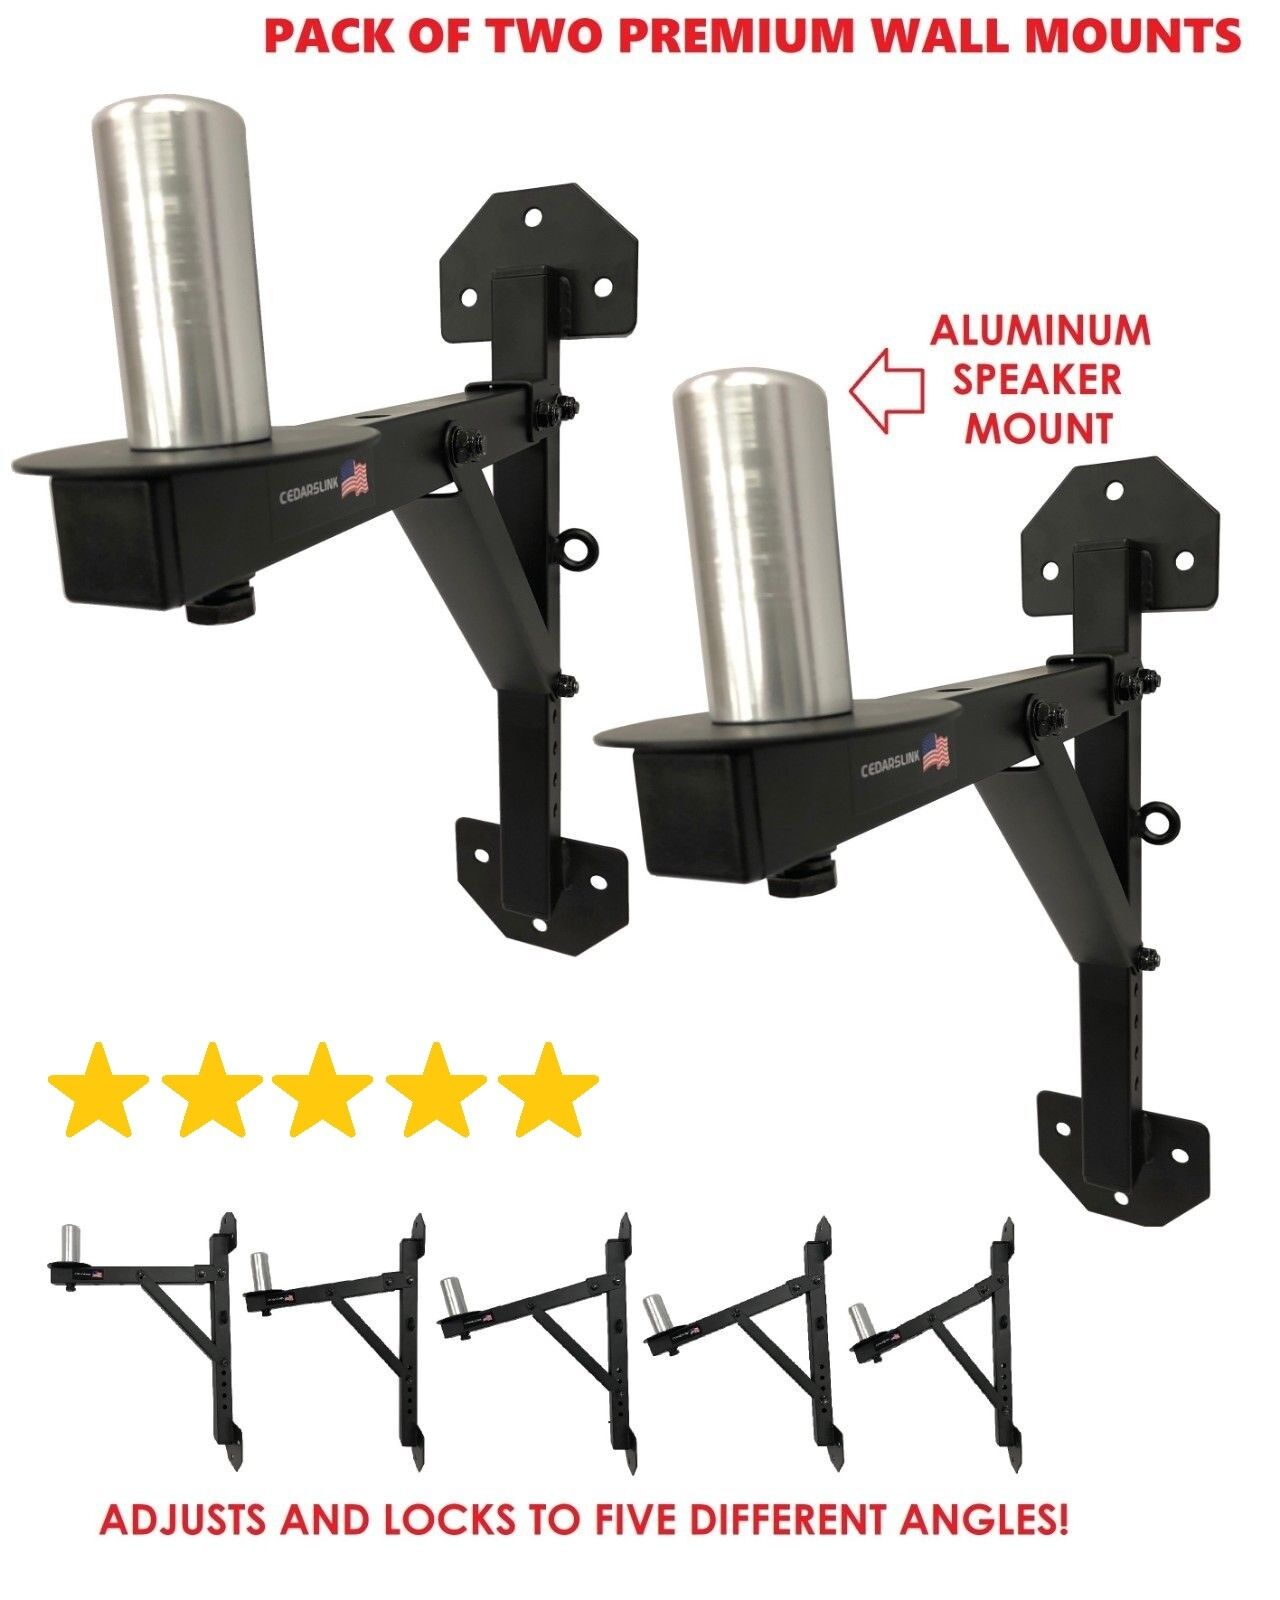 PA Speaker Wall Mount Brackets - 2 Pro-Audio Stands Post Hol